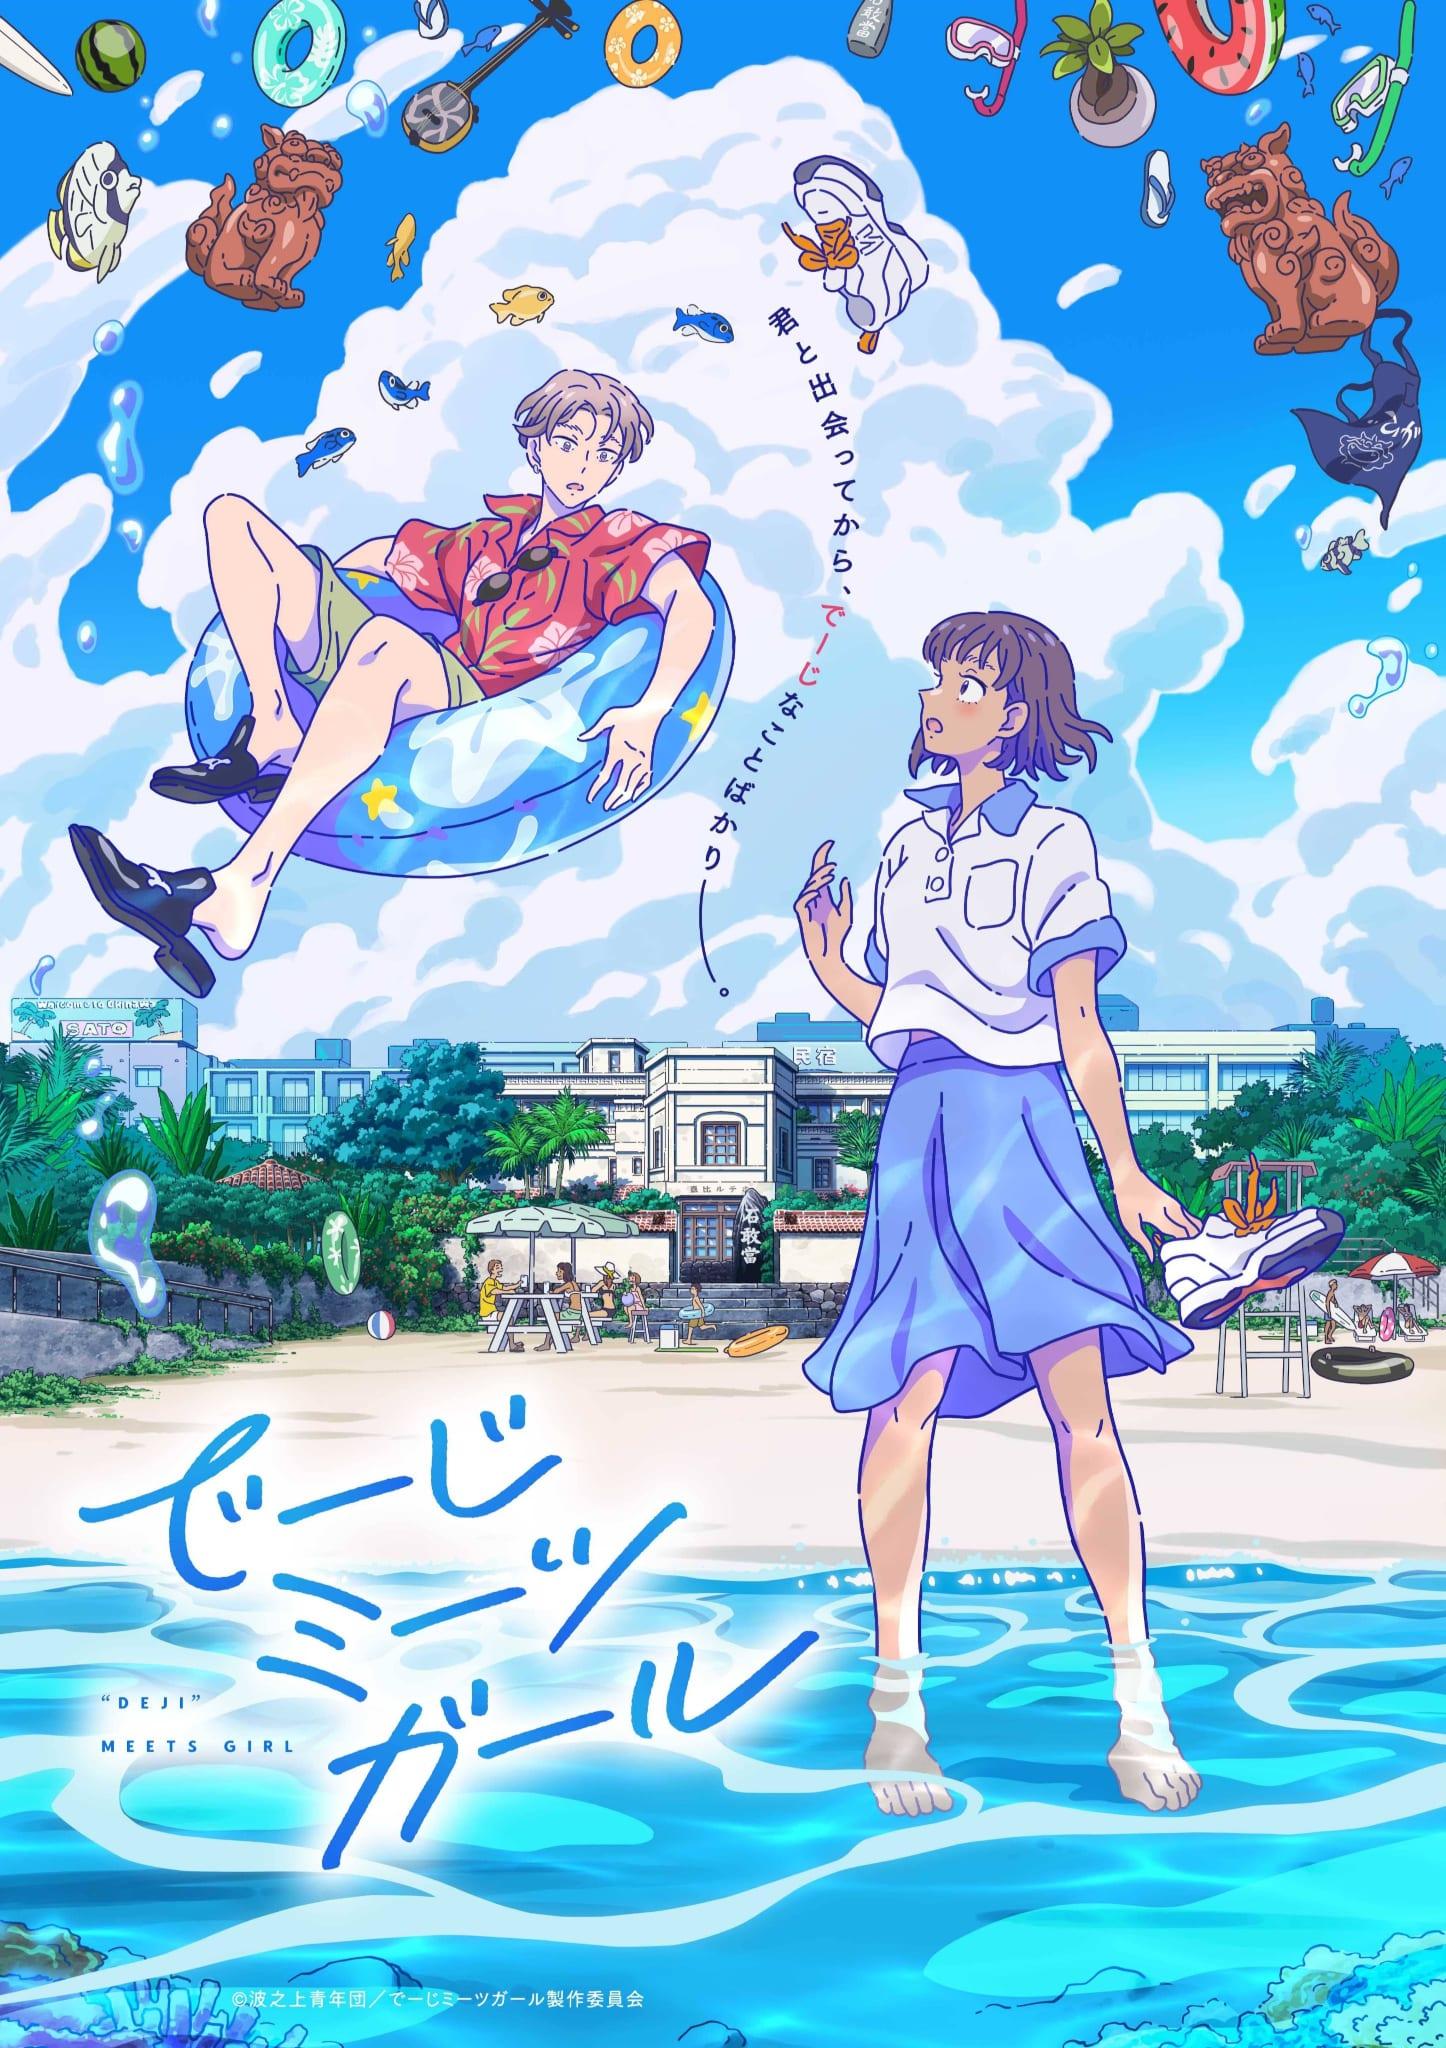 "L'anime ""Deji"" Meets Girl révèle sa Date de Sortie | Anim'Otaku"